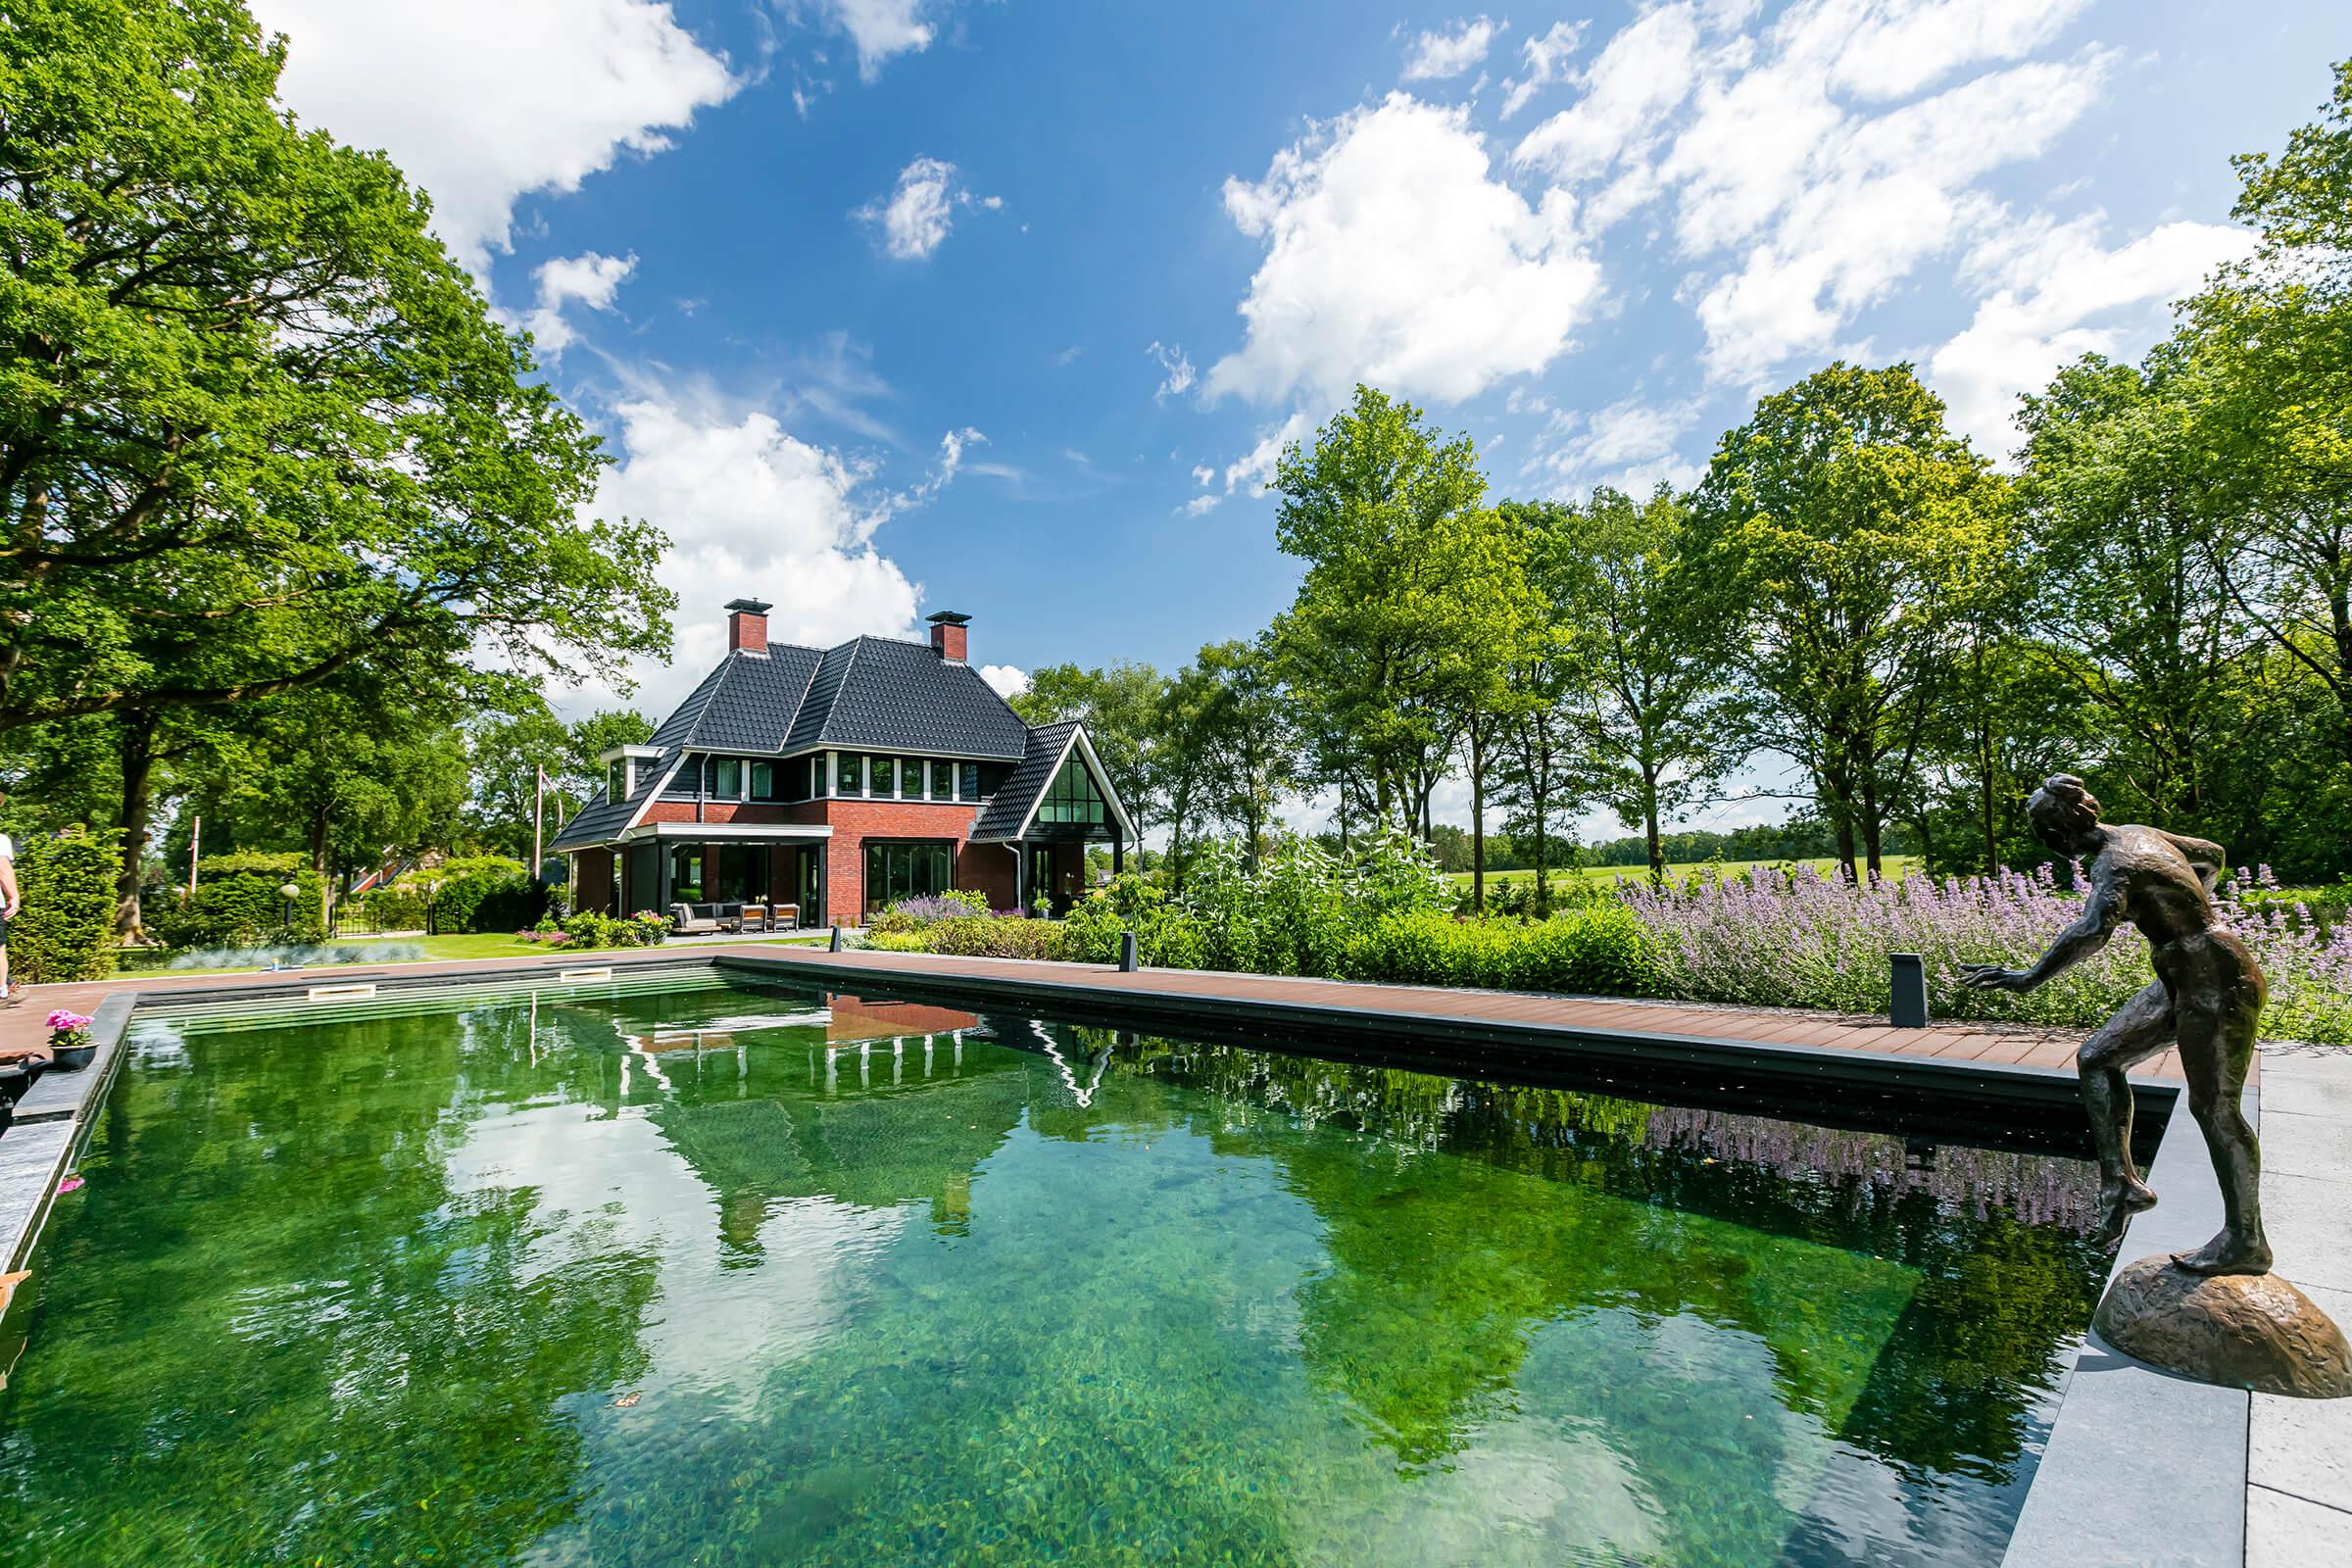 Villa te Gasselte - zwembad in de achtertuin - Lichtenberg Exclusieve Villabouw